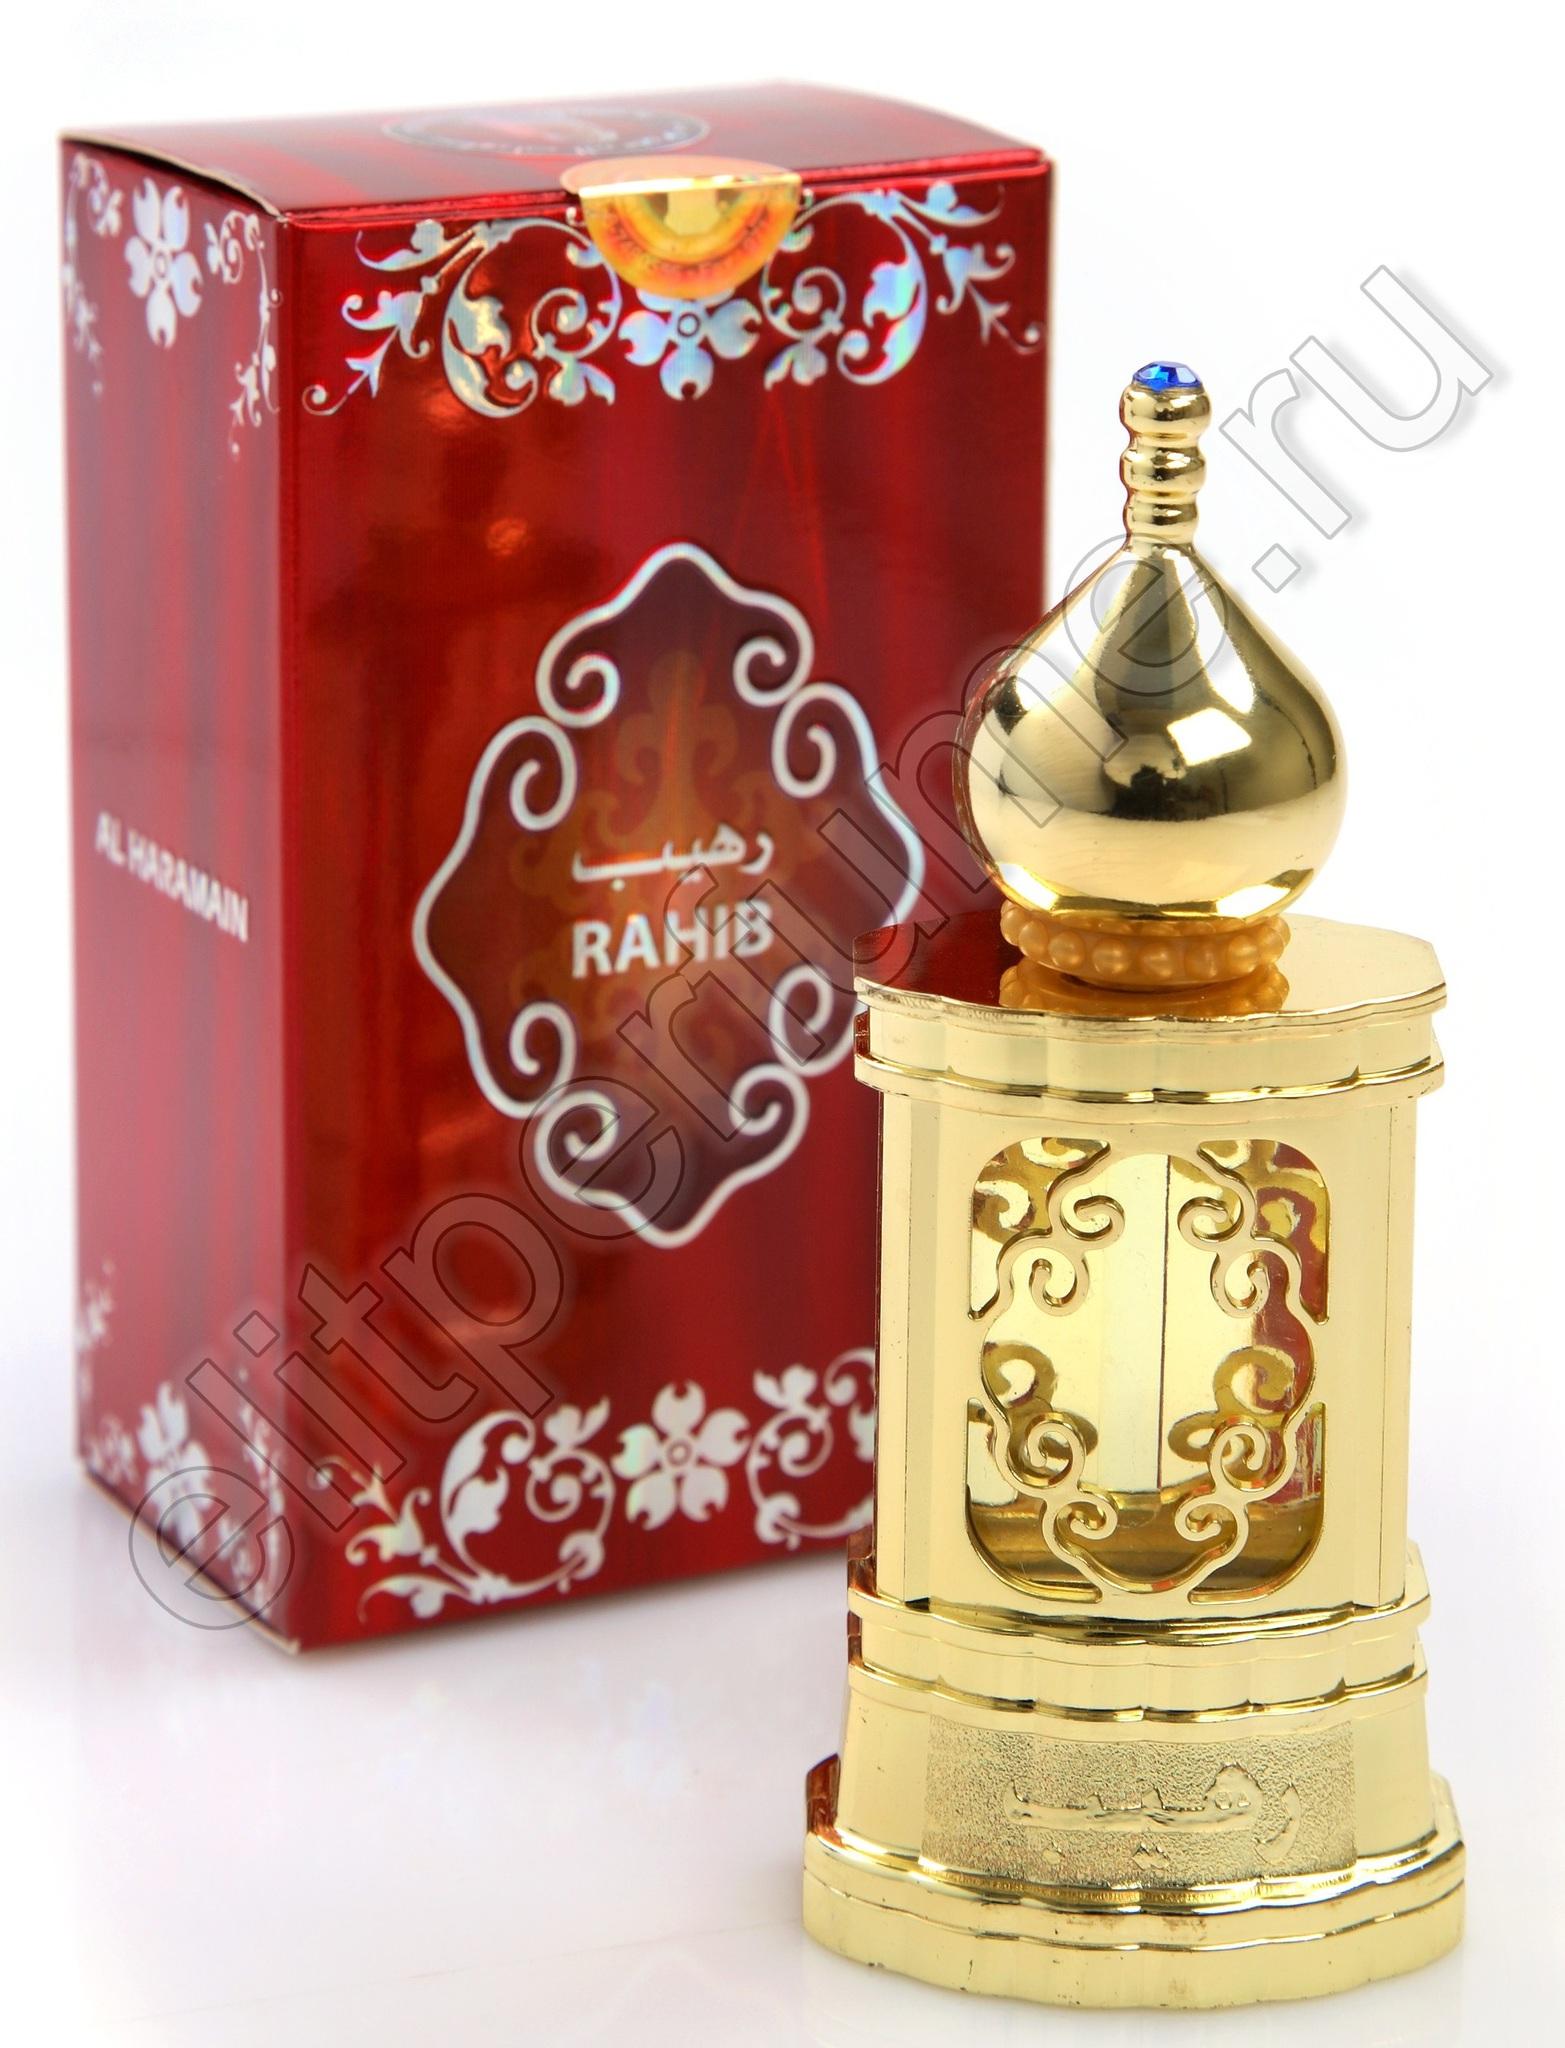 Пробники для духов Рахиб Rahib 1 мл арабские масляные духи от Аль Харамайн Al Haramin Perfumes